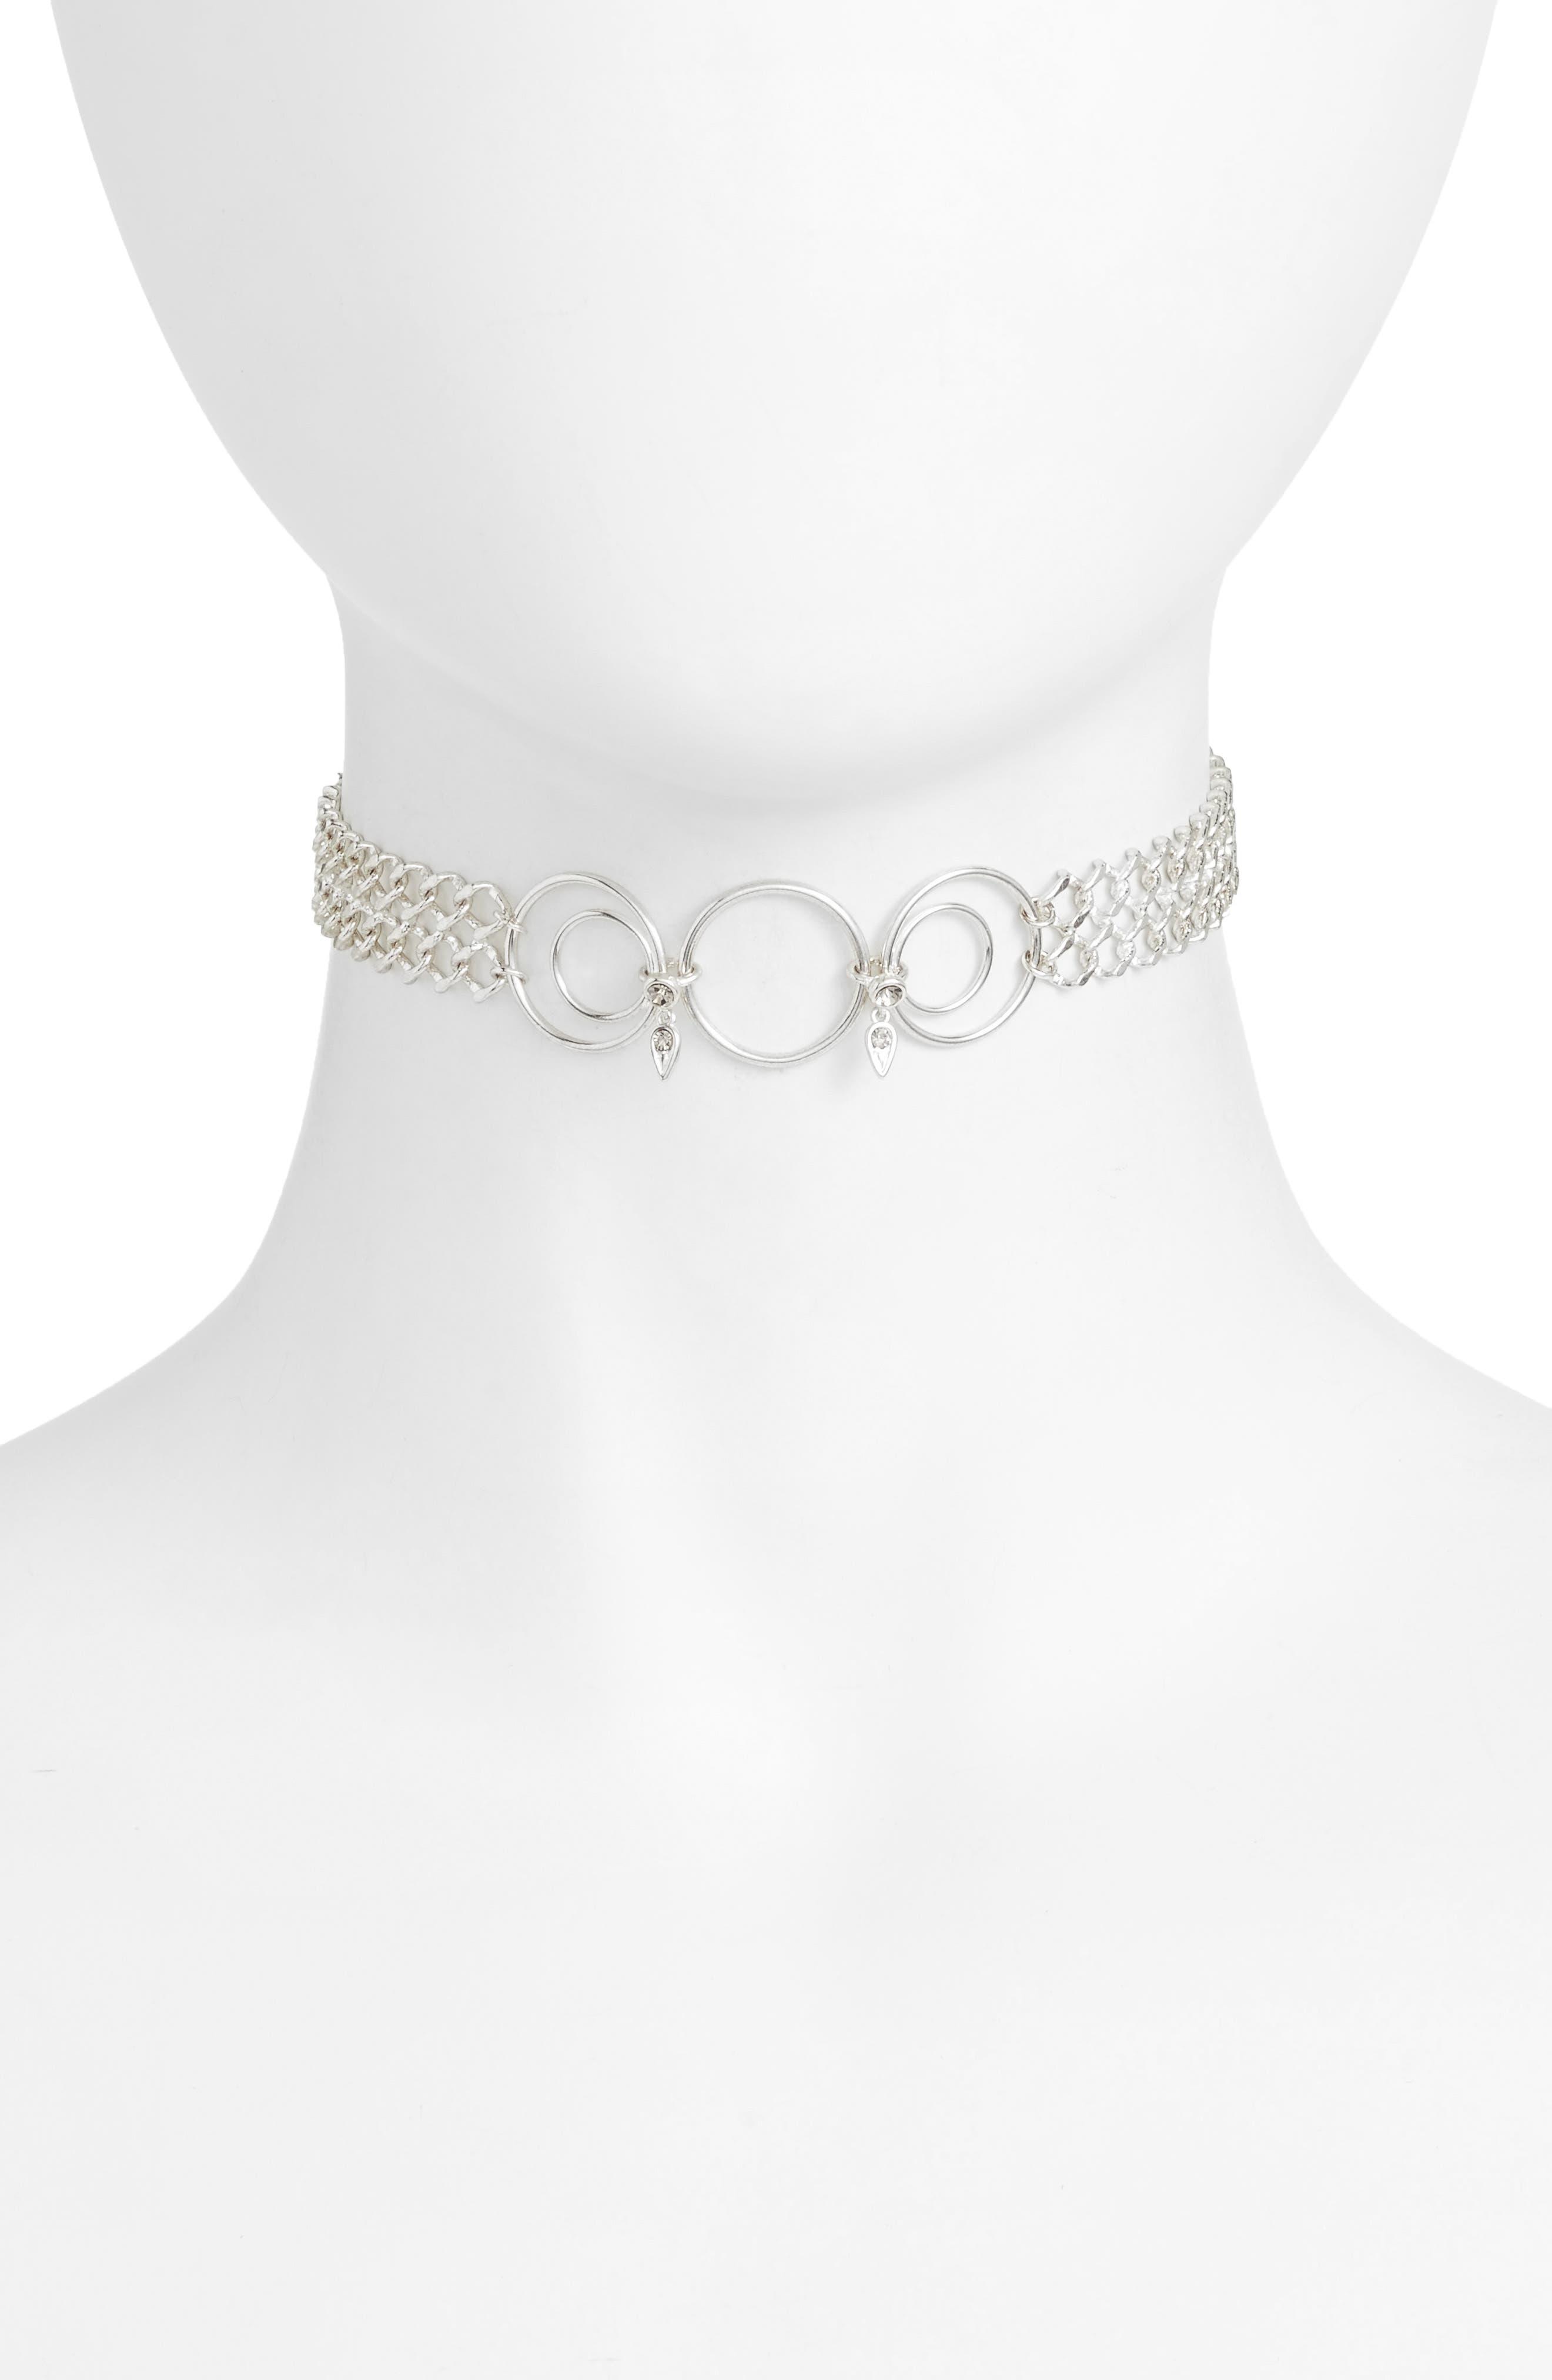 Main Image - Luv AJ Eclipse Choker Necklace